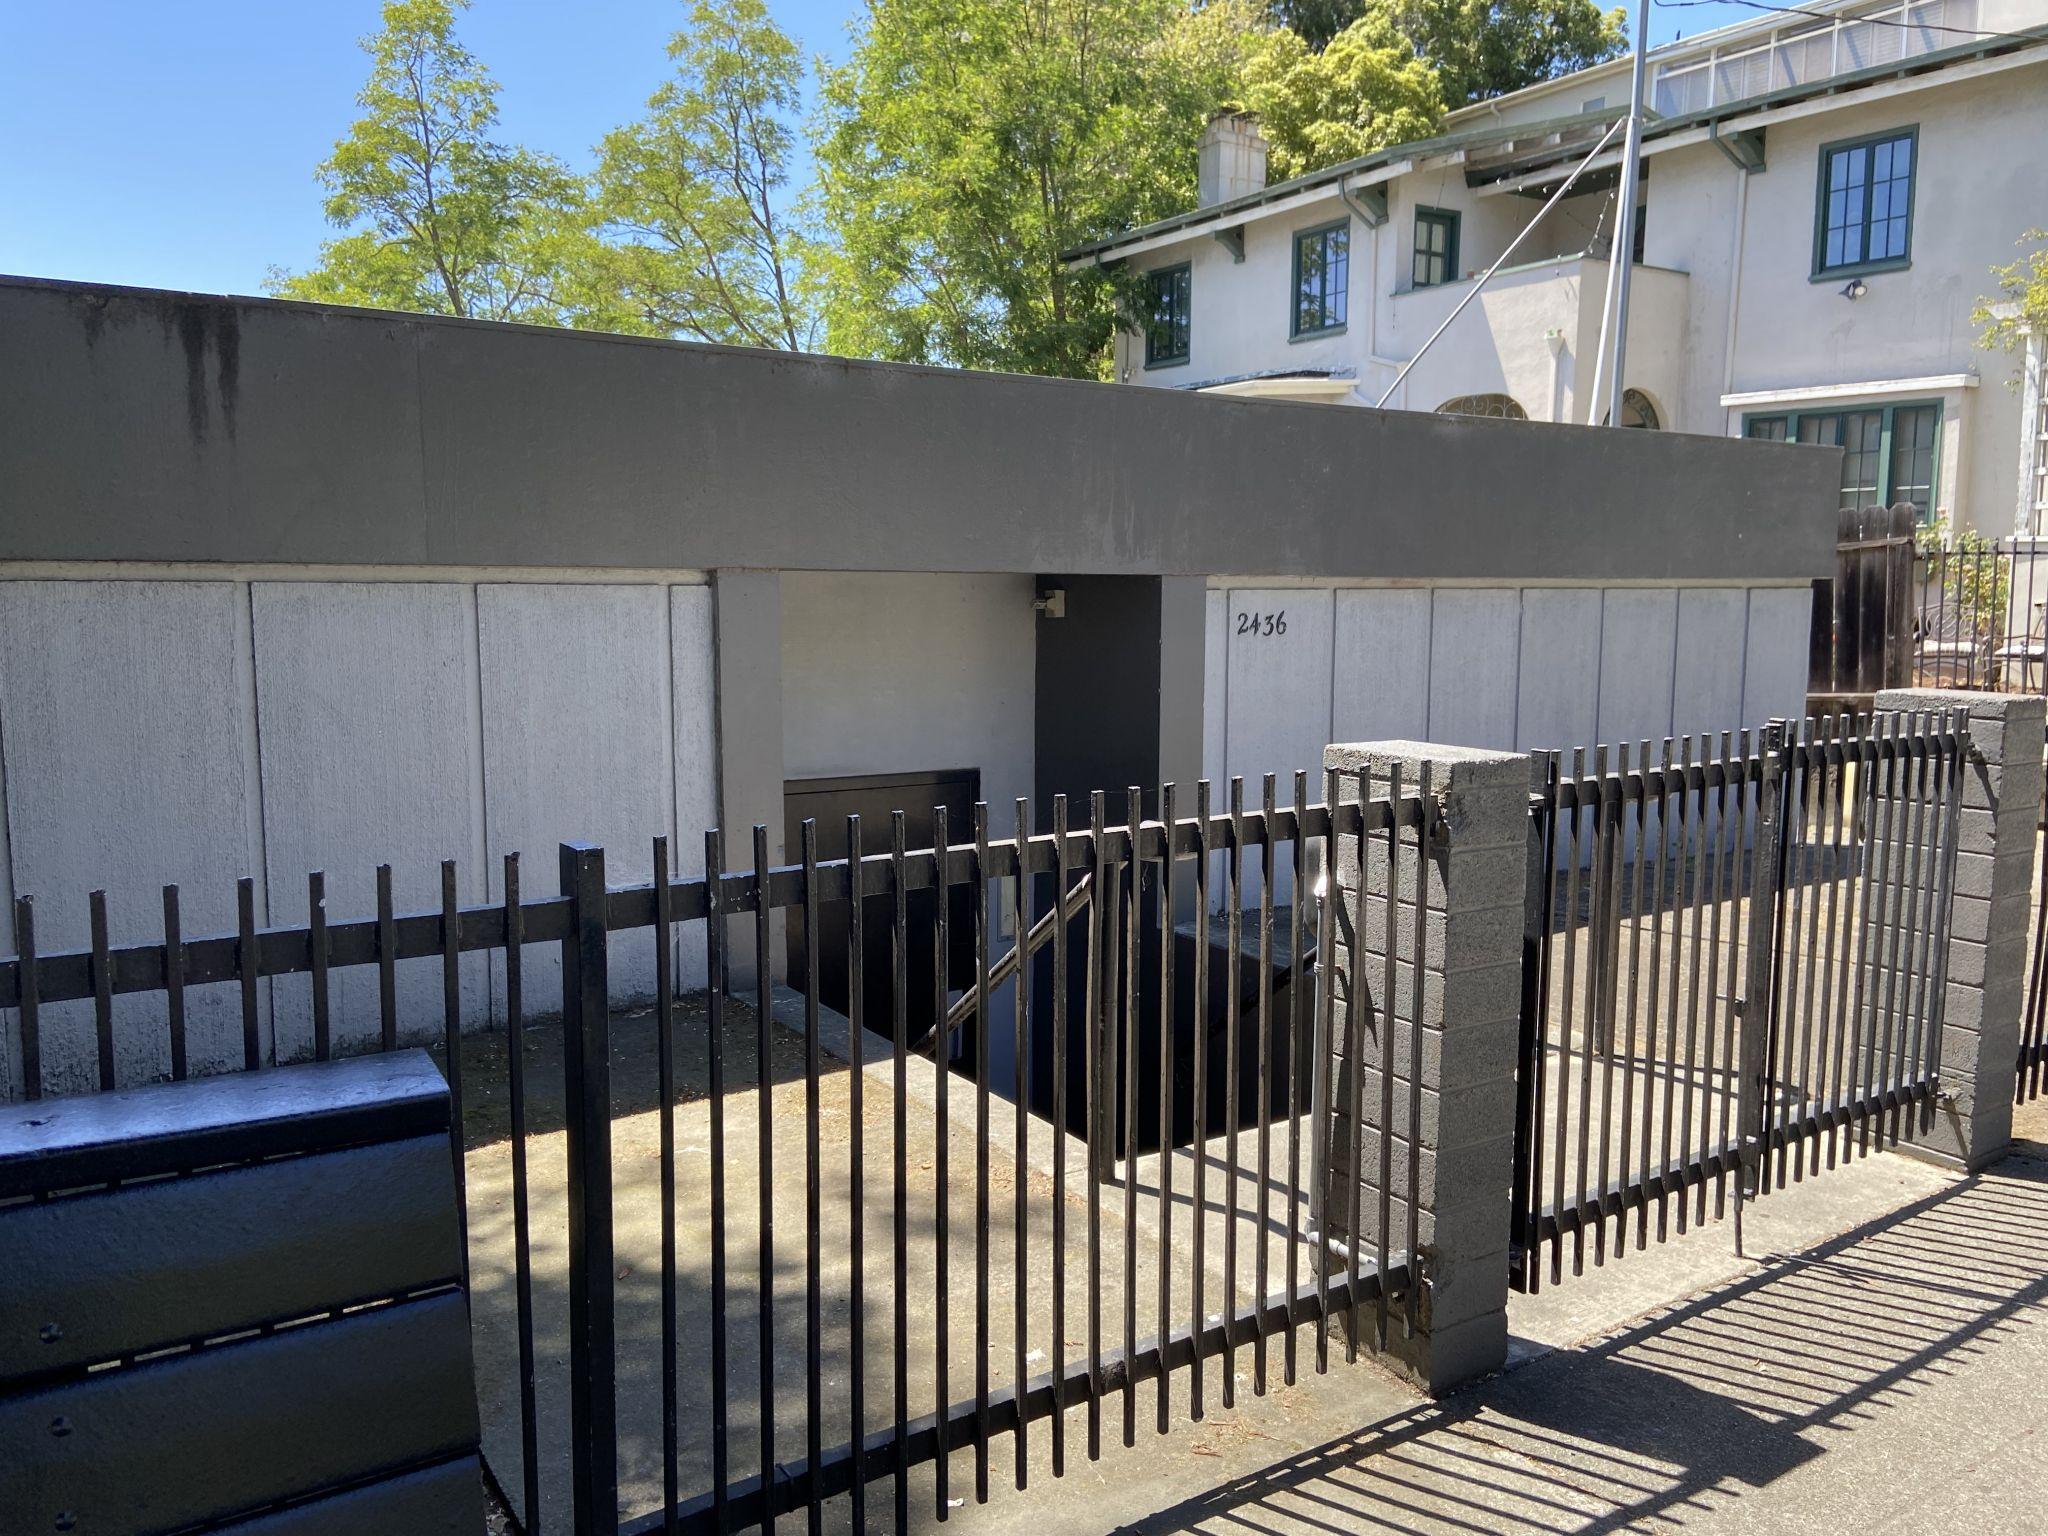 The Bay Area secret society 'tomb' hiding in plain sight